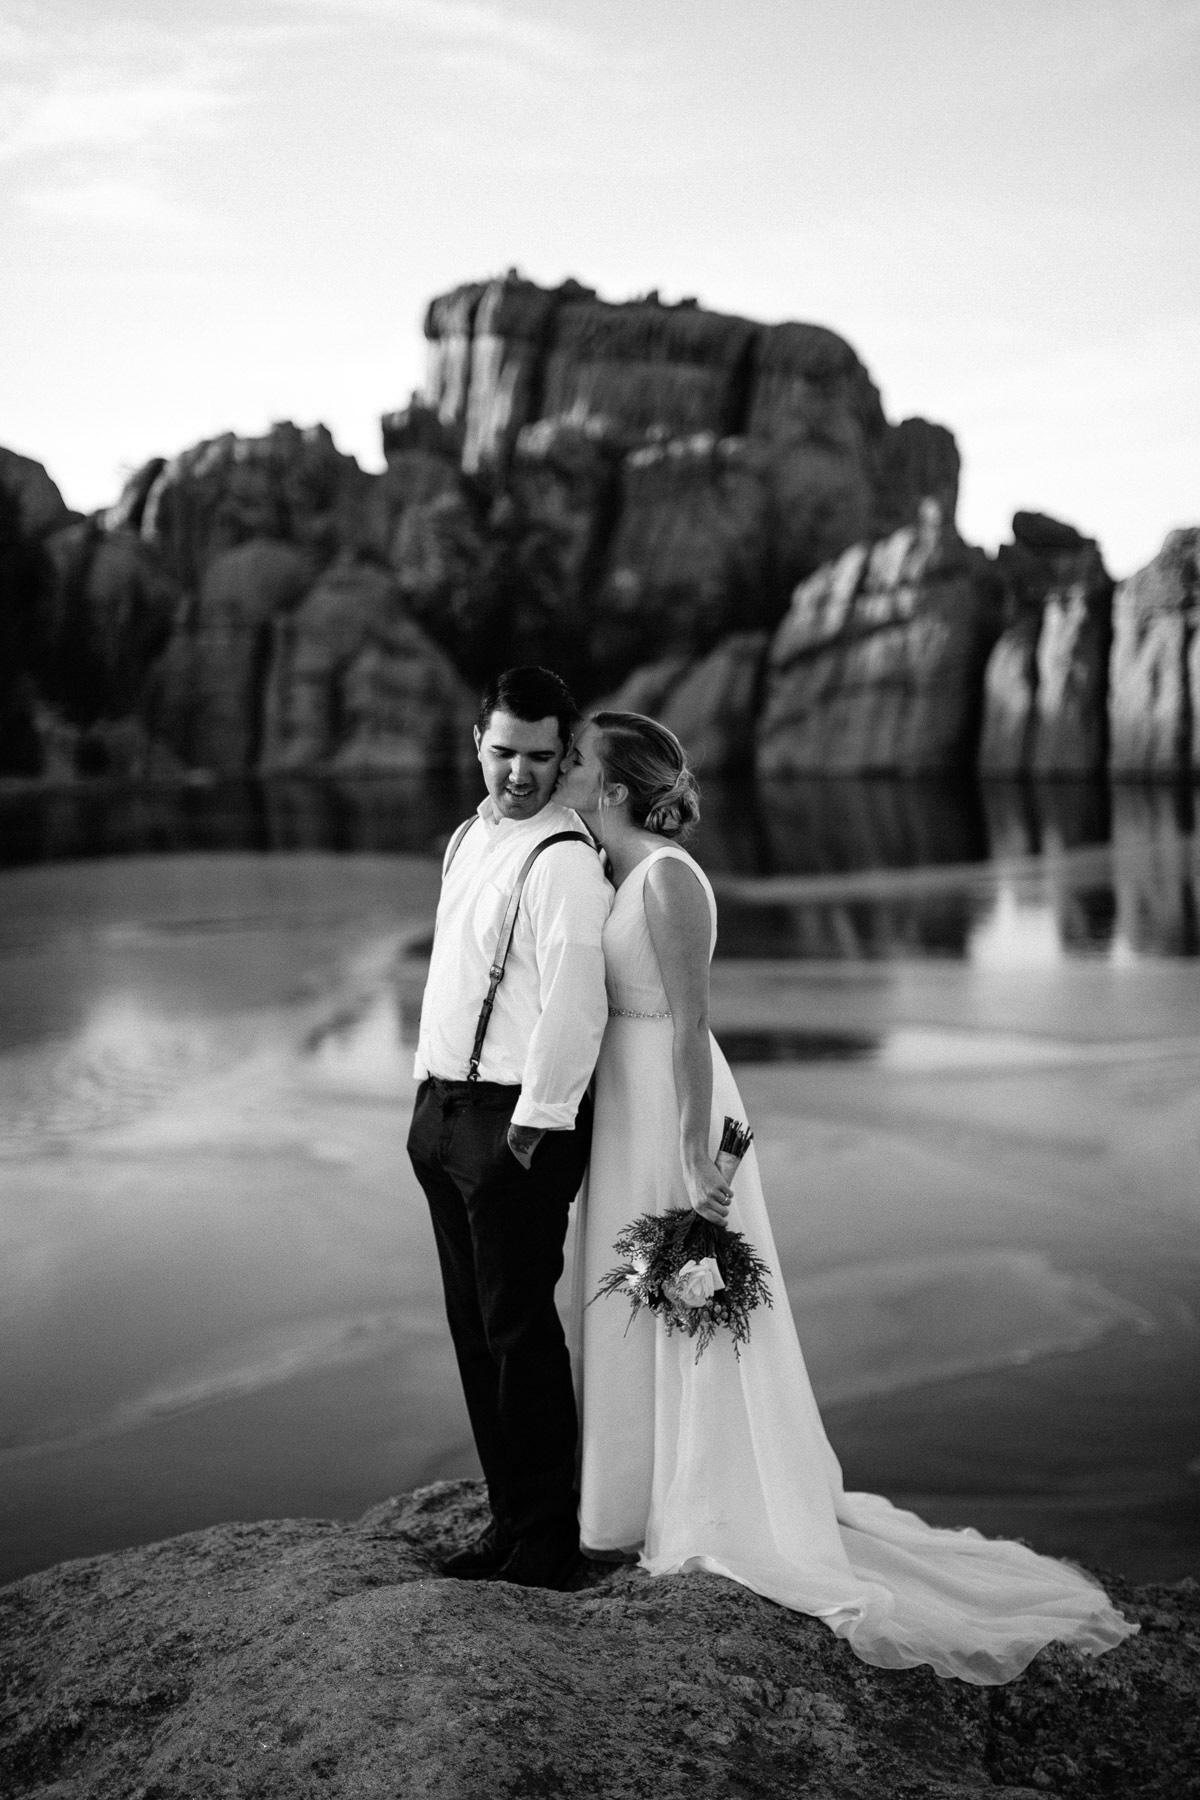 sioux-falls-black-hills-rapid-city-elopement-wedding-adventure-photographer-custer-sylvan-lake-34.jpg